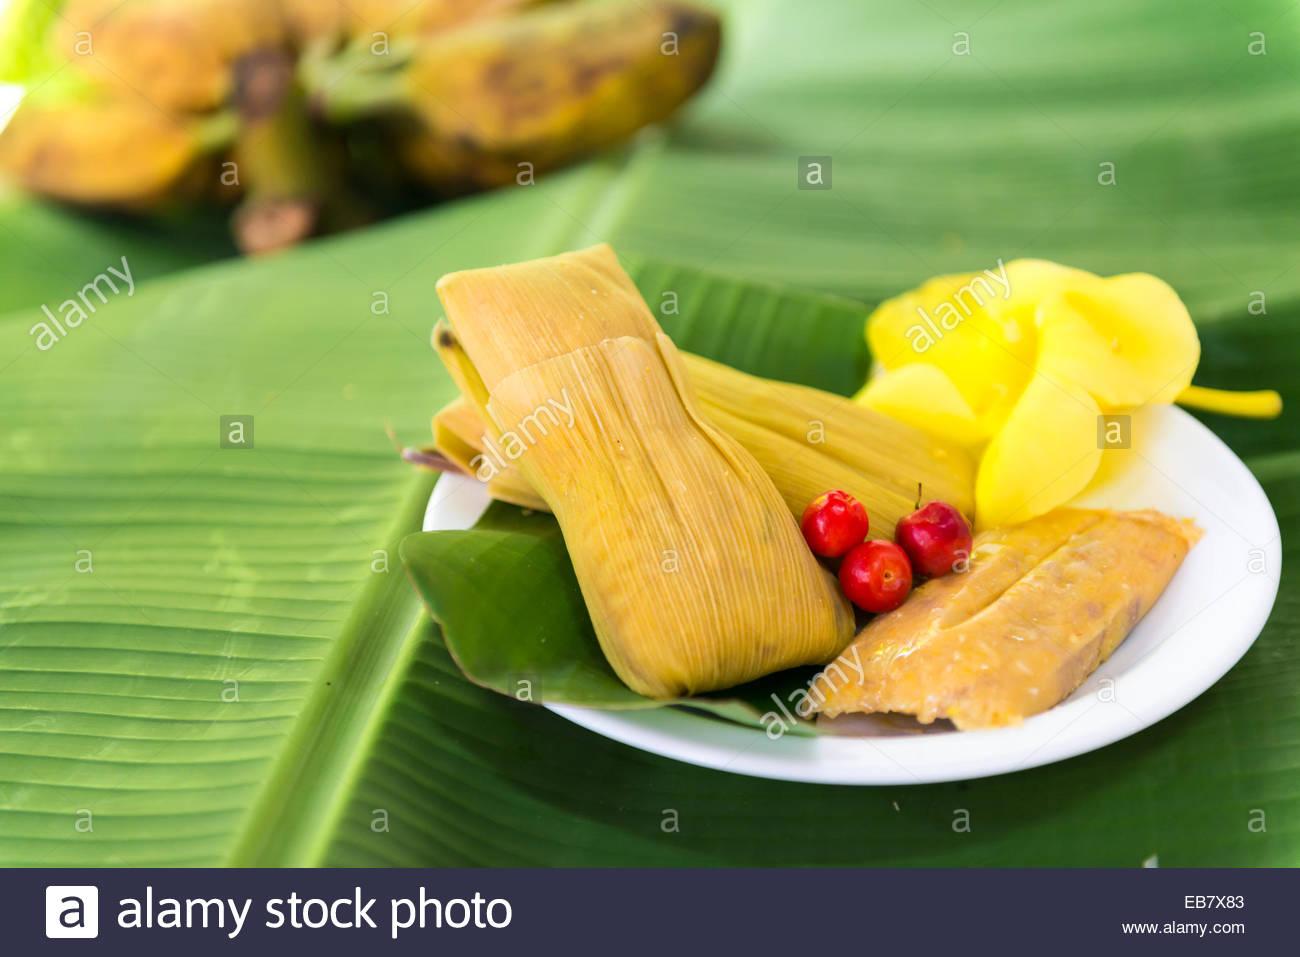 Tamale Food Stockfotos & Tamale Food Bilder - Seite 3 - Alamy